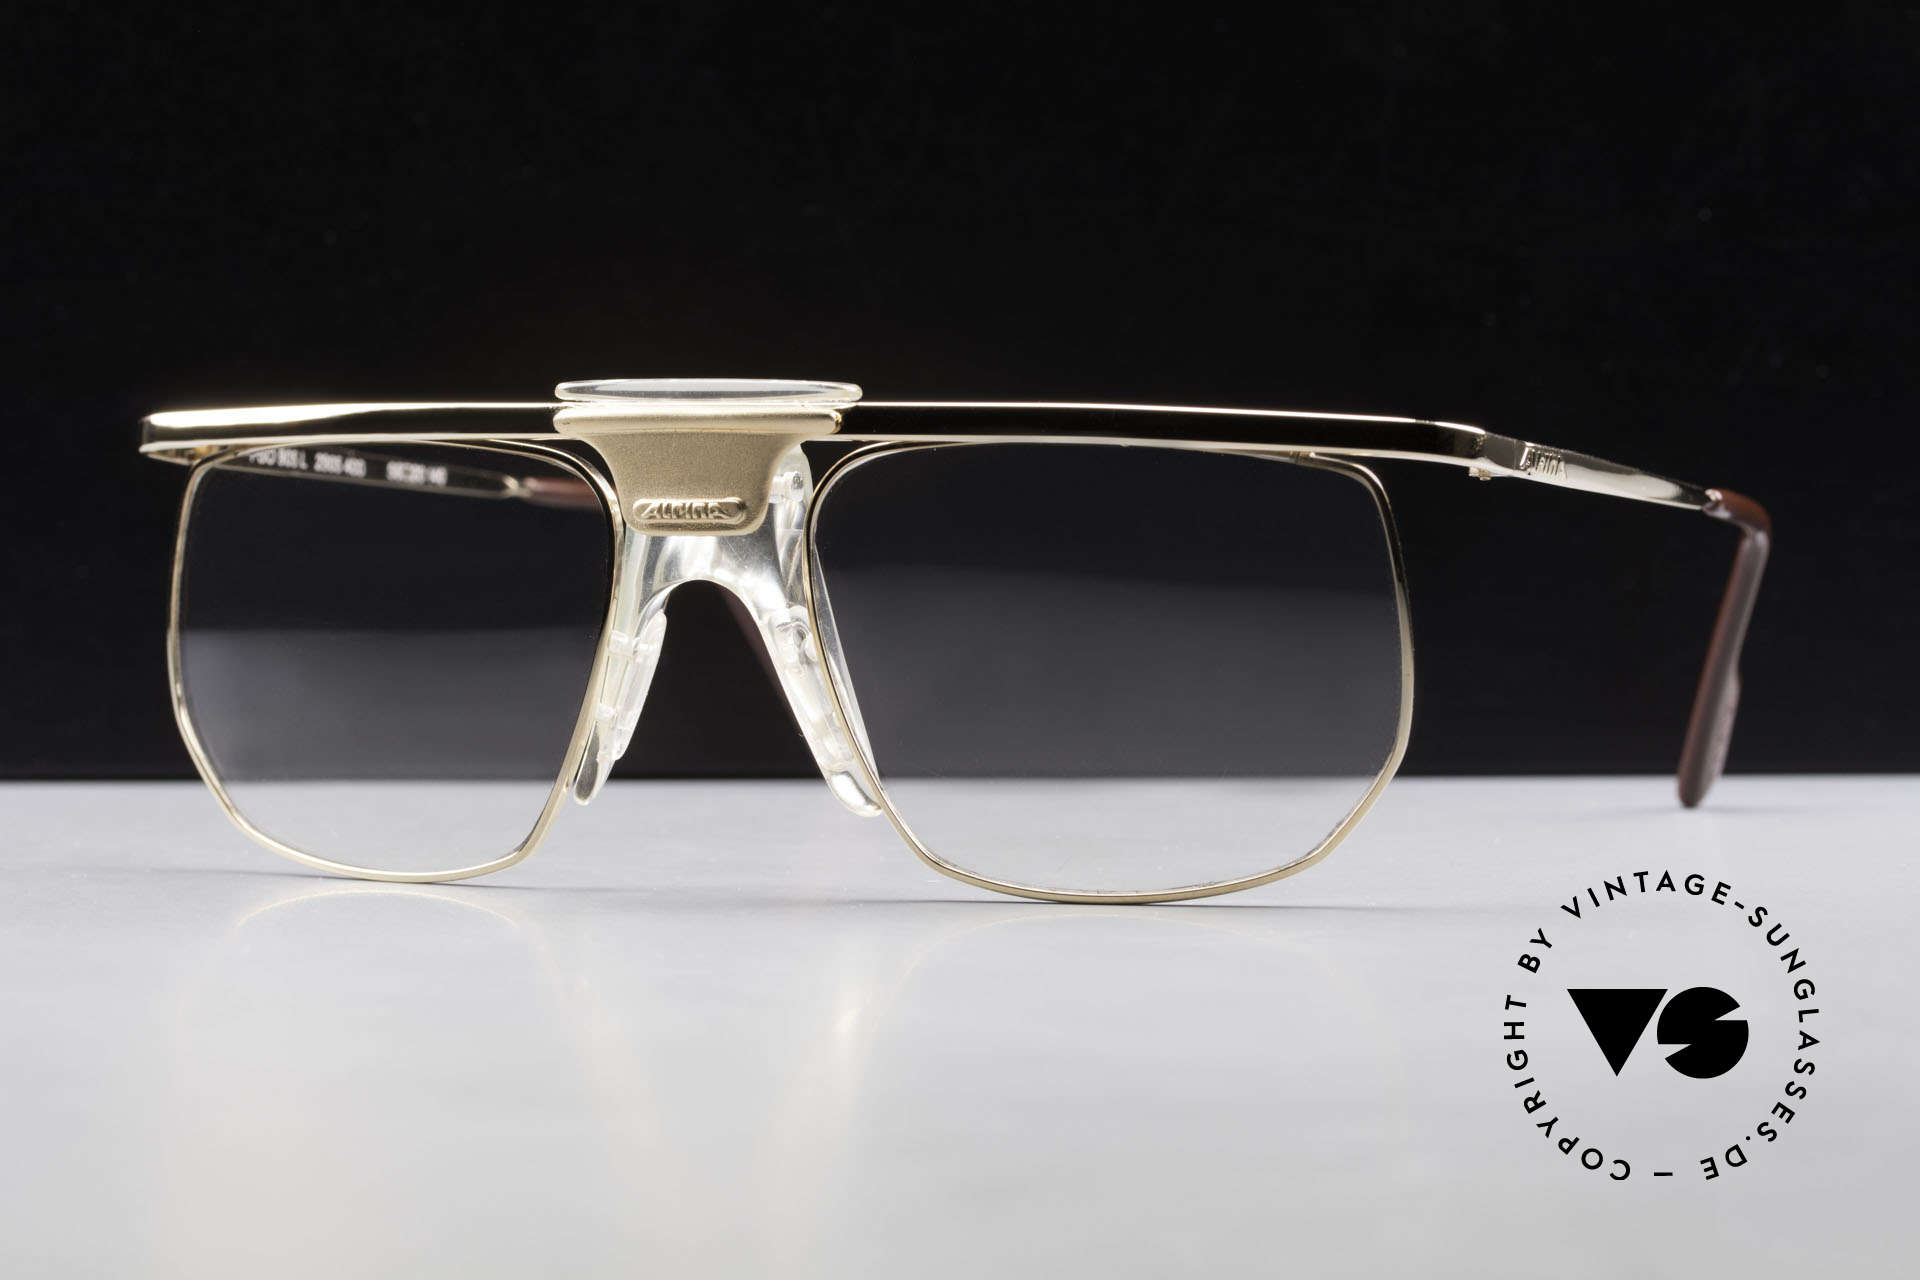 Alpina PSO 905 Vintage Glasses Saddle Bridge, ultra rare vintage Alpina glasses from the 90's, Made for Men